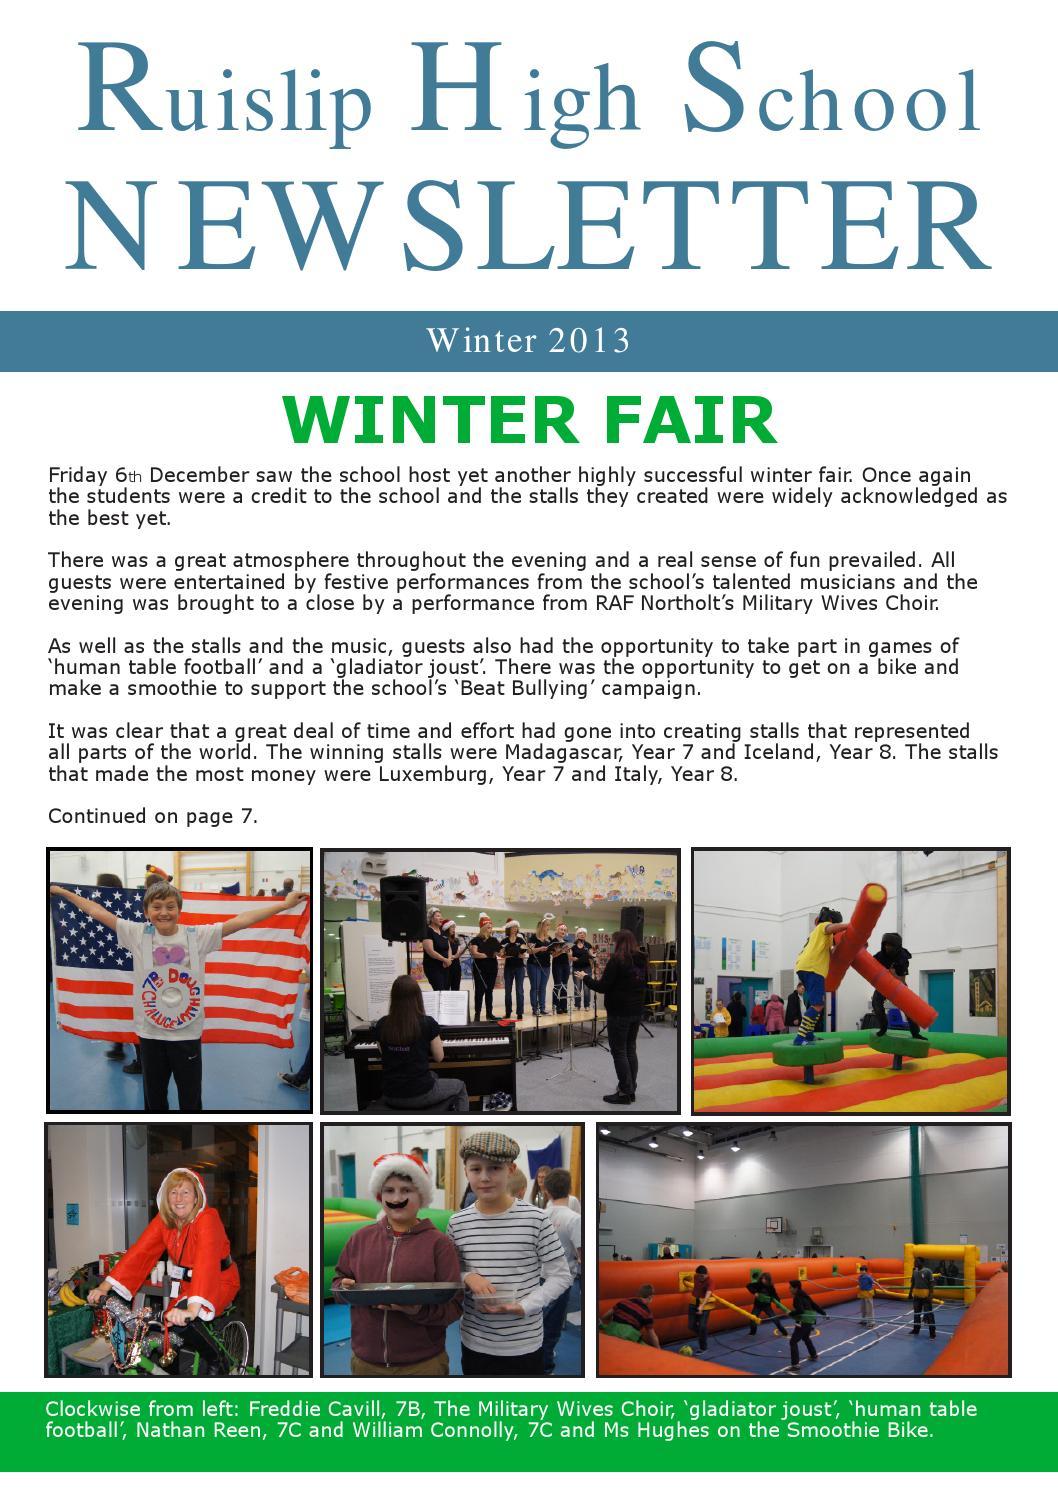 Winter Newsletter 2013 by Ruislip High School - issuu